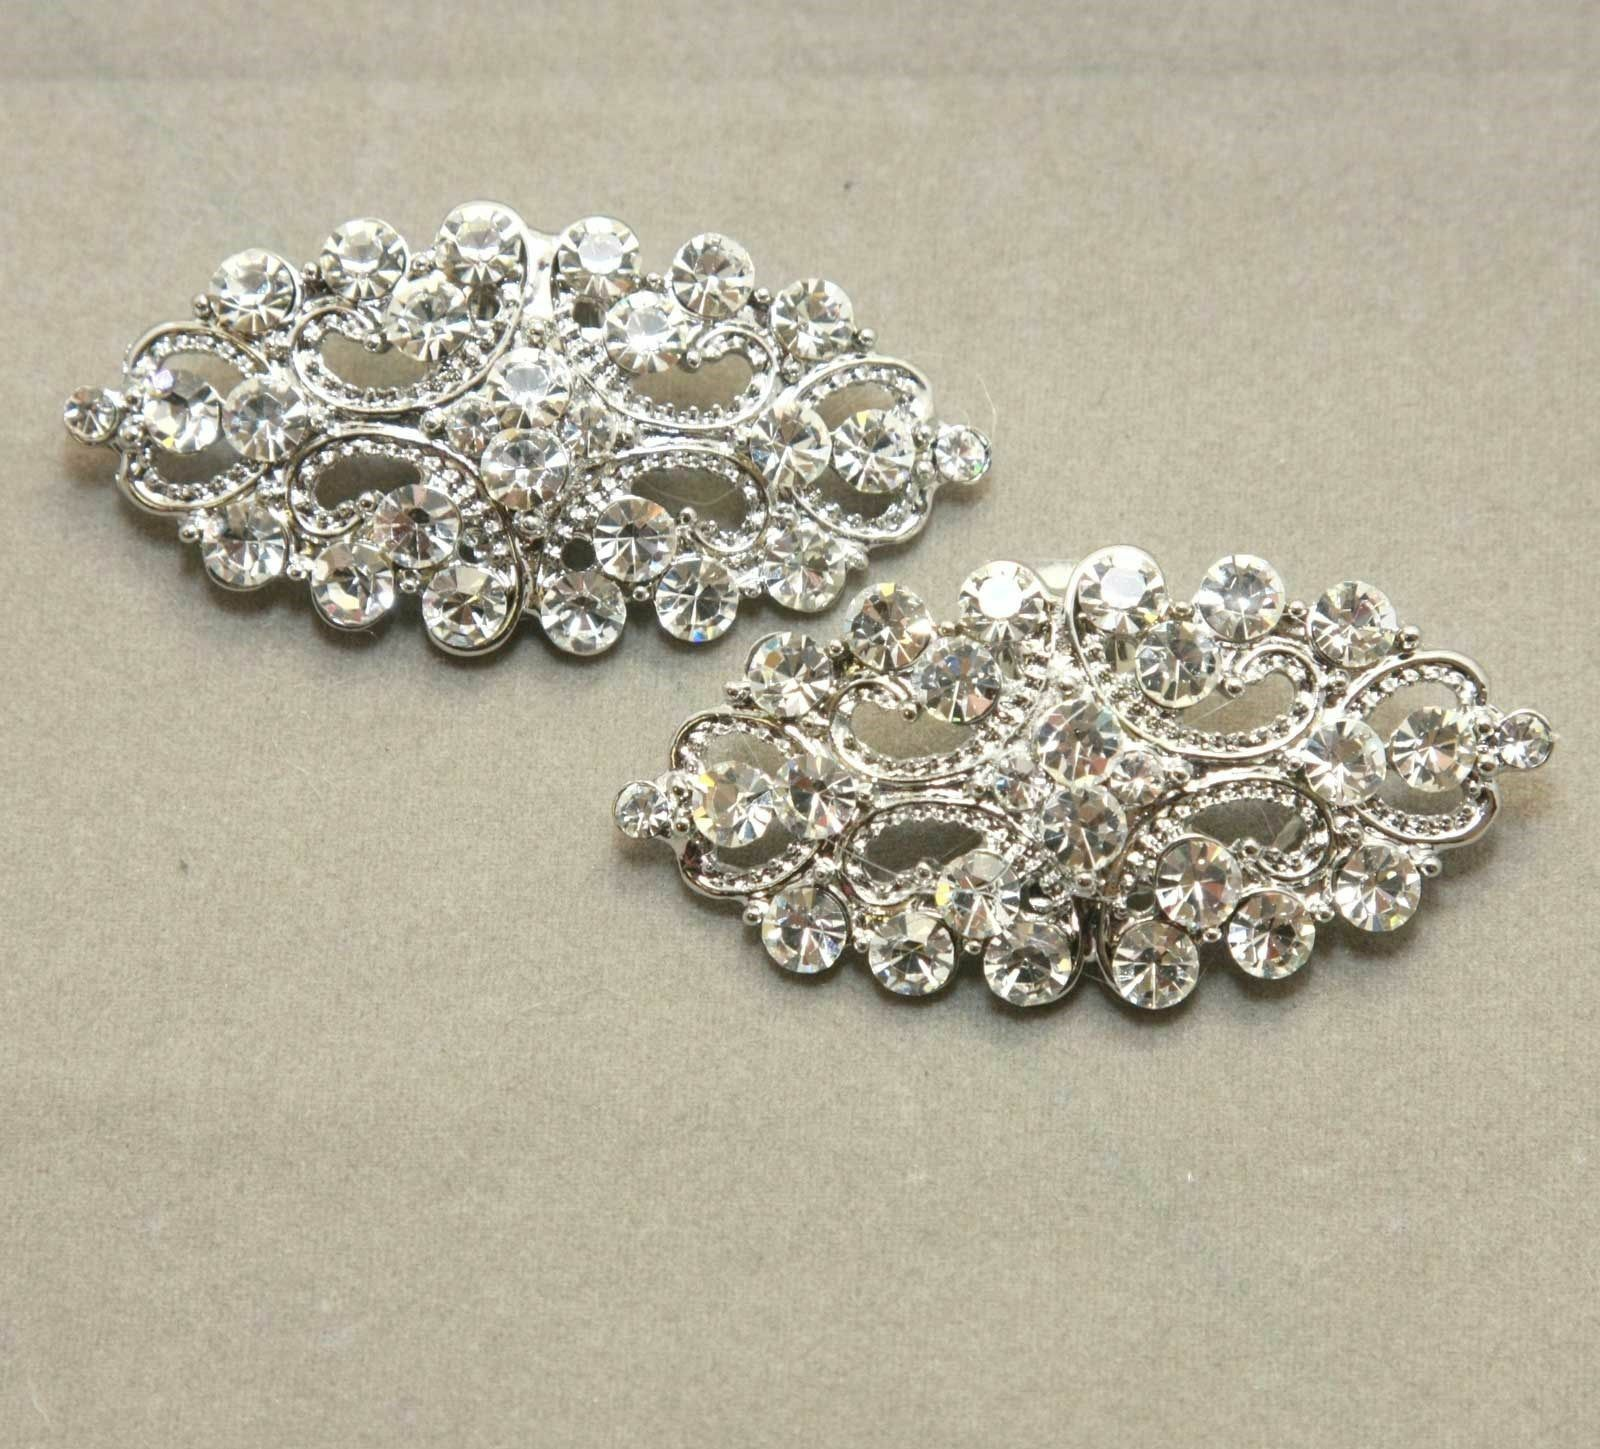 2 Pcs Vintage Style Diamante Crystal Bridal High Heel Shoe Clips Decoration